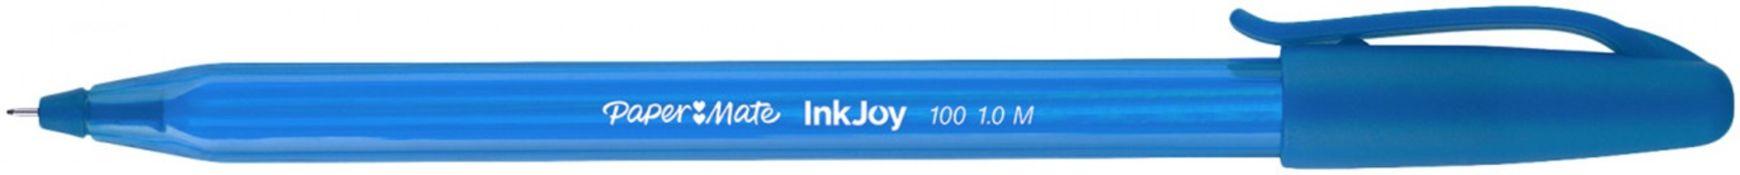 10,000 x Papermate Inkjoy Pens | Total RRP £5,000